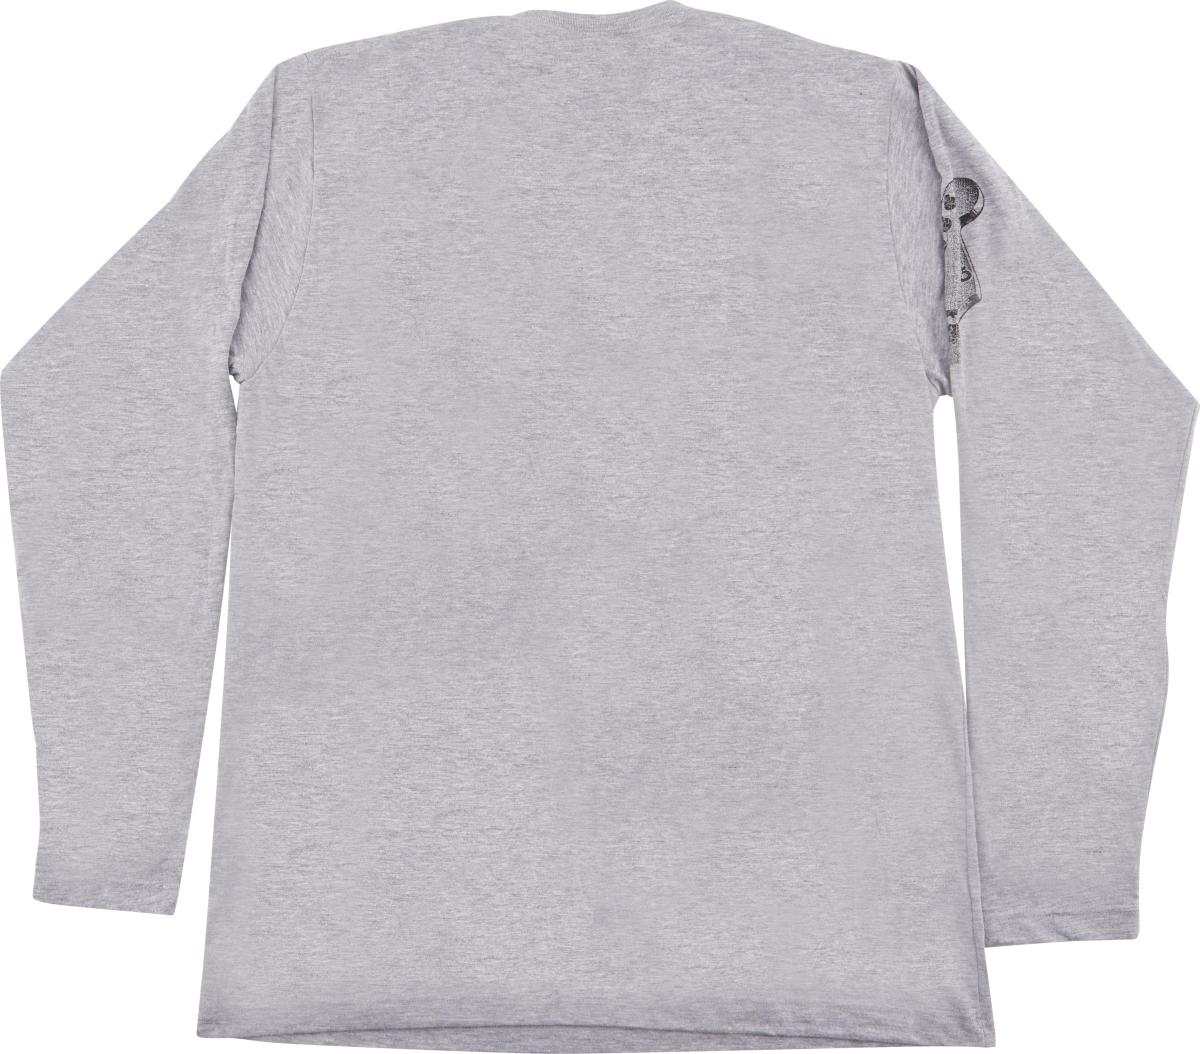 Charvel Charvel® Headstock Long Sleeve T-Shirt, Gray, S